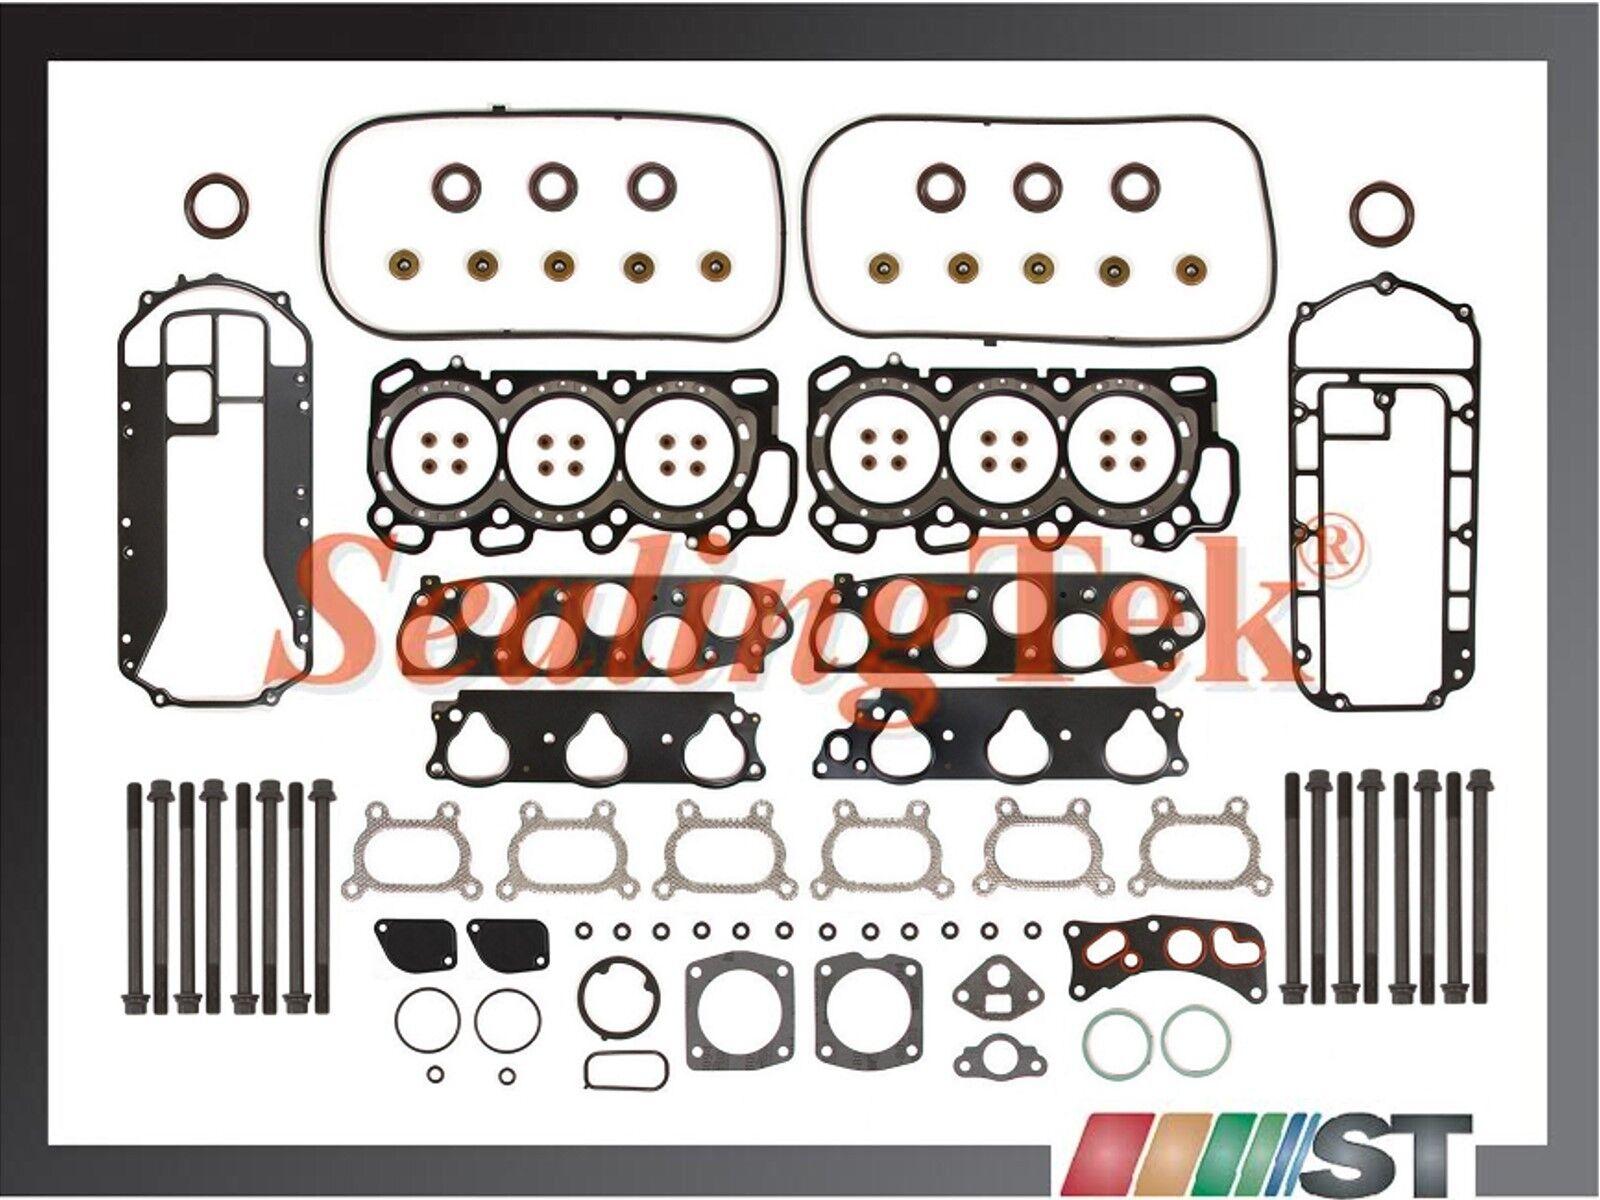 Head Gasket Bolts Set for 05-09 Acura MDX TL Honda 3.2 /& 3.5 SOHC J32A3 J35A